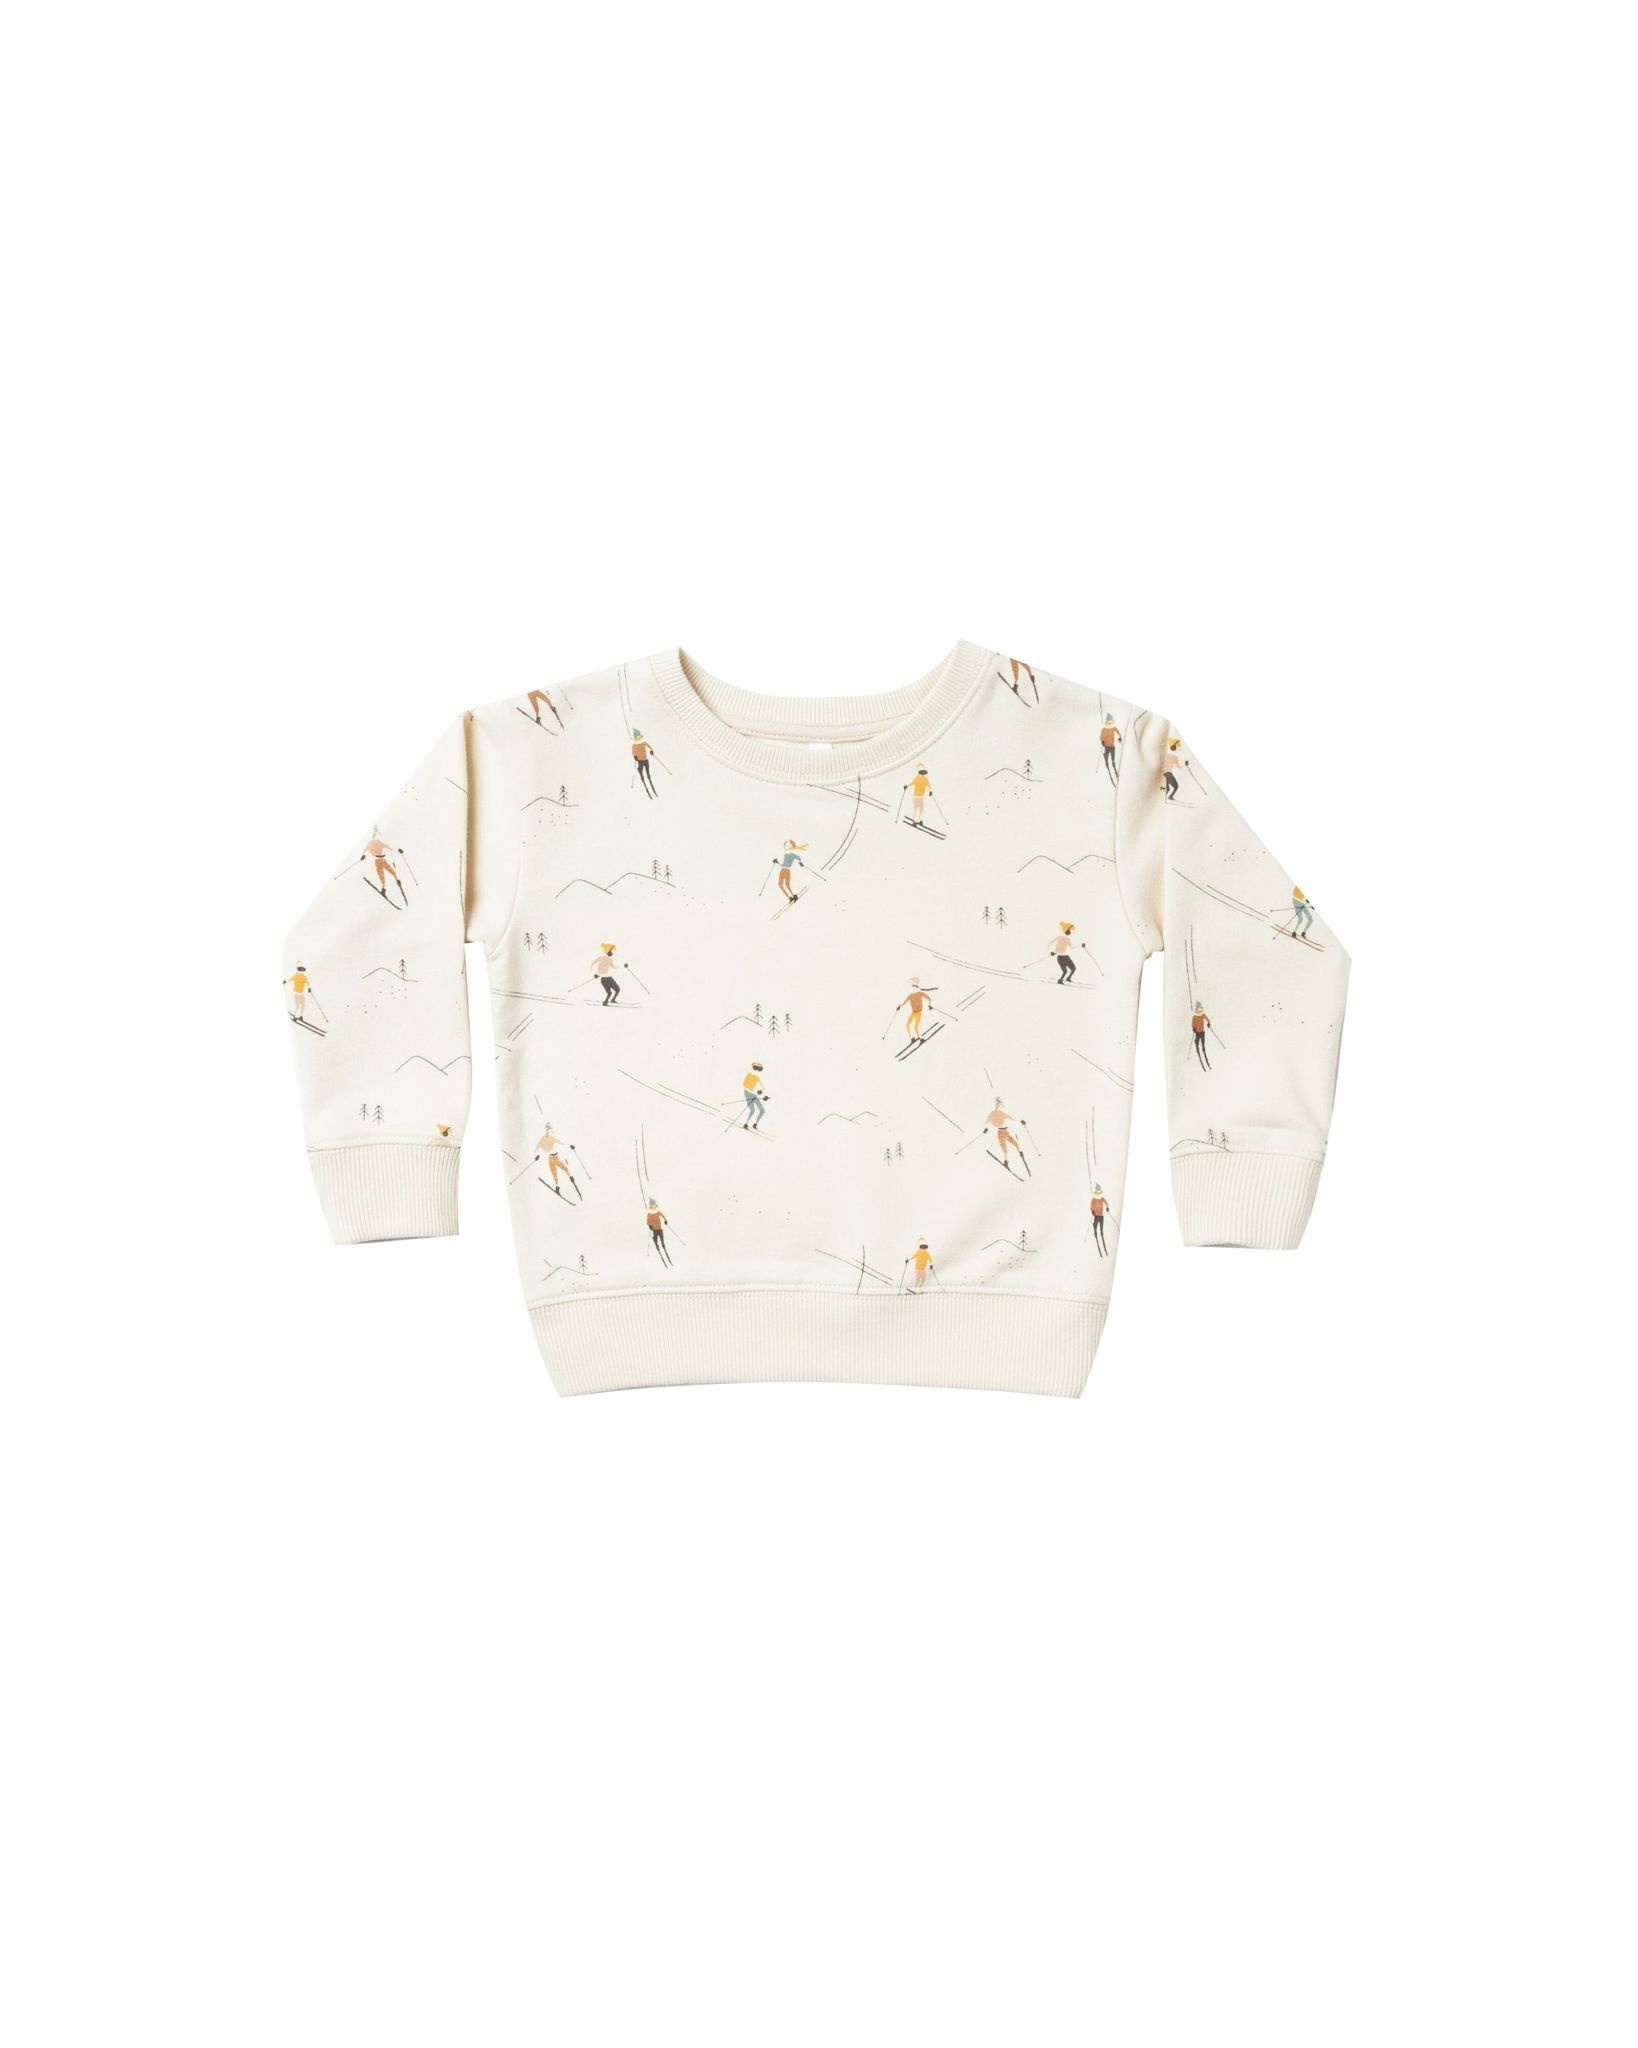 RYLEE AND CRU Ski Baby Sweatshirt